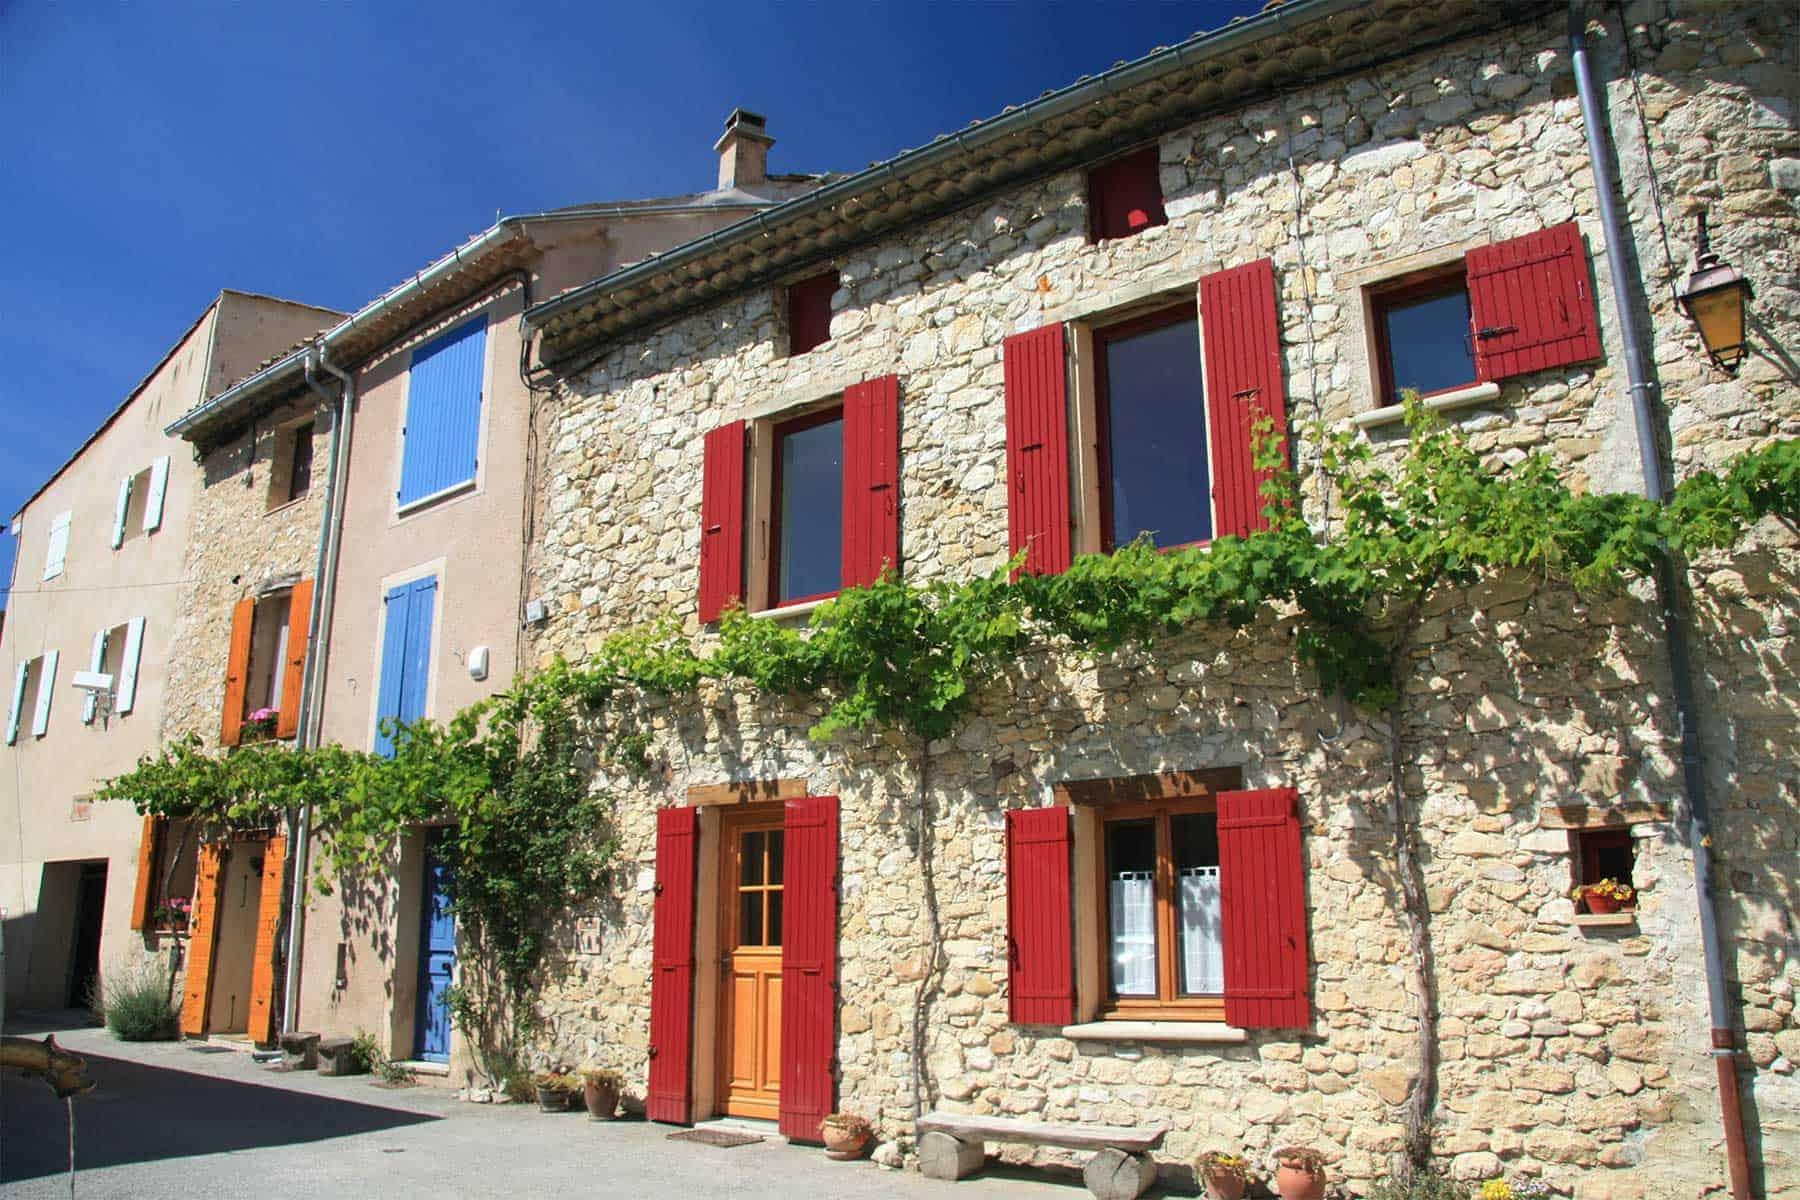 Rental Property in France